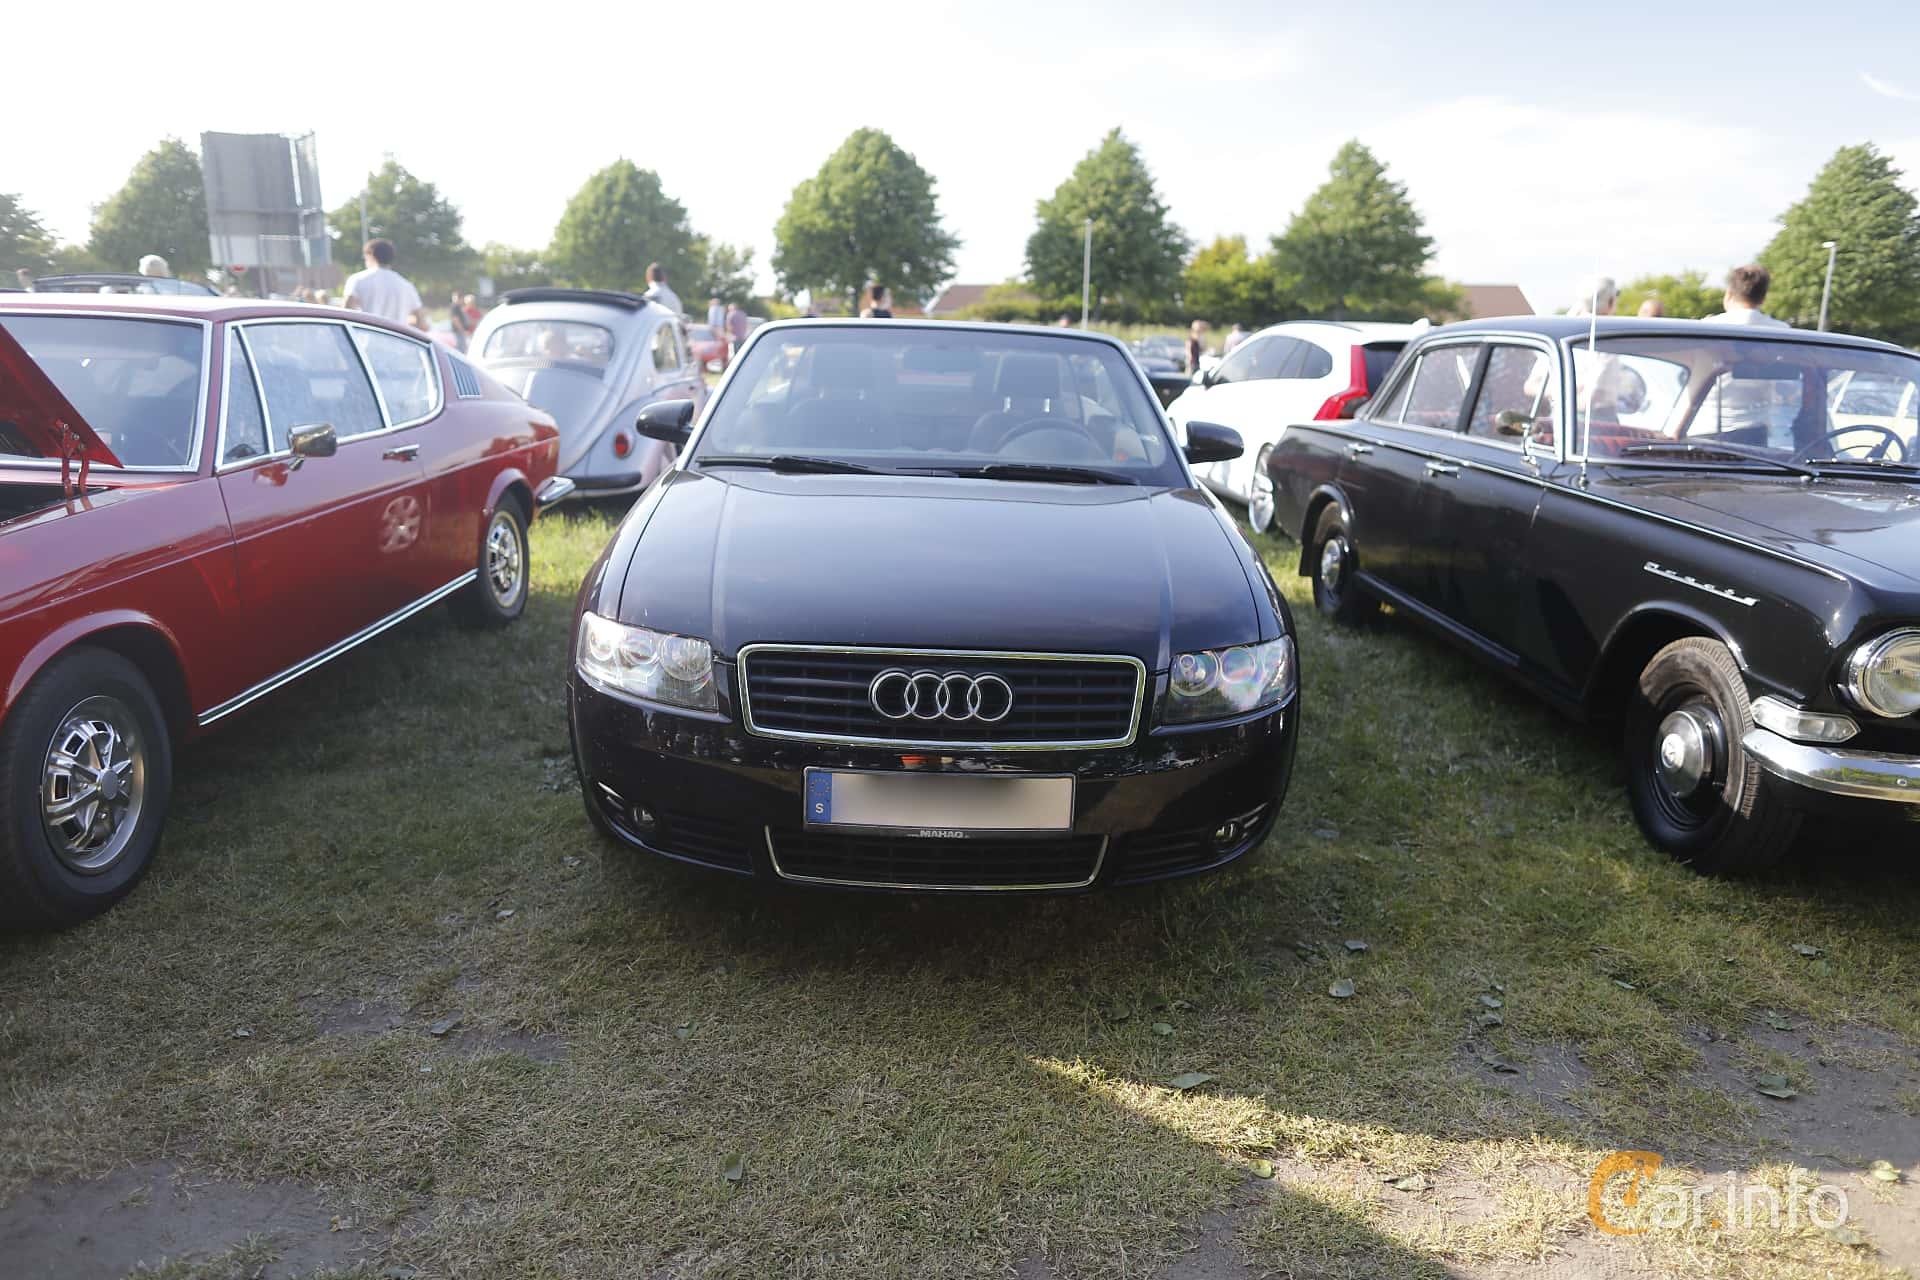 3 Images Of Audi A4 Cabriolet 18 T Manual 163hp 2005 By Jonasbonde Engine Schematics Front 163ps At Tisdagstrffarna Vikingatider V